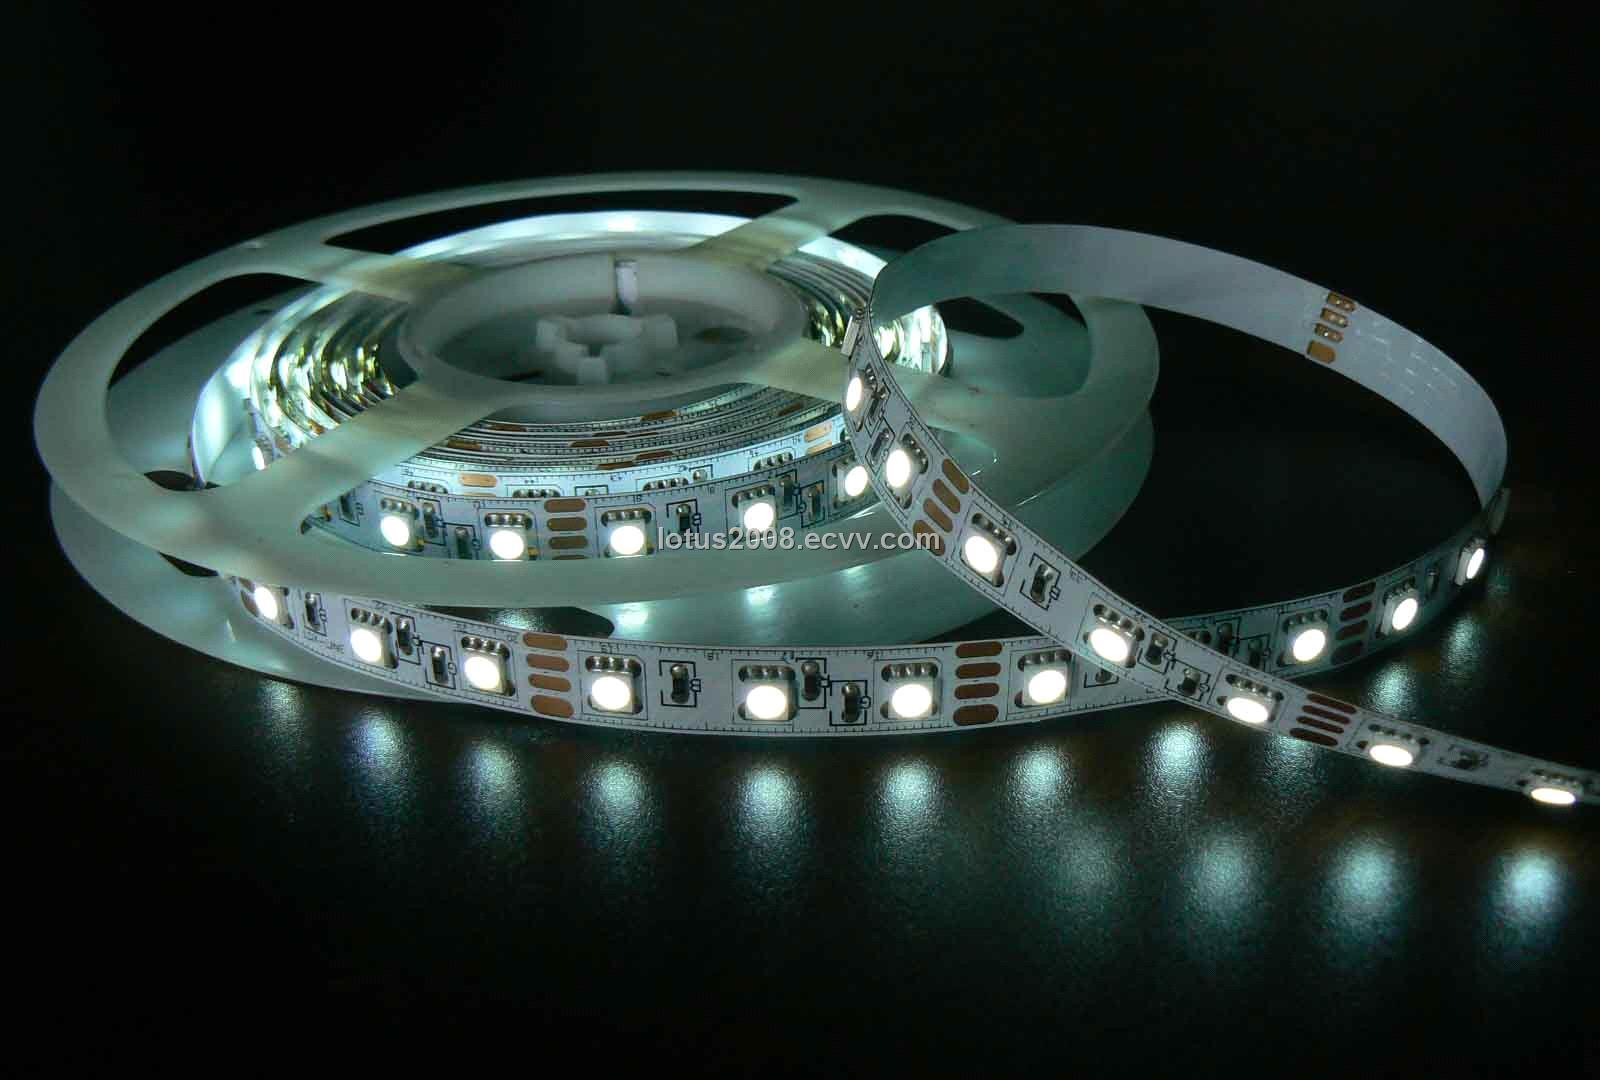 5050 smd led flex strip lights 150leds purchasing souring agent 5050 smd led flex strip lights 150leds aloadofball Gallery